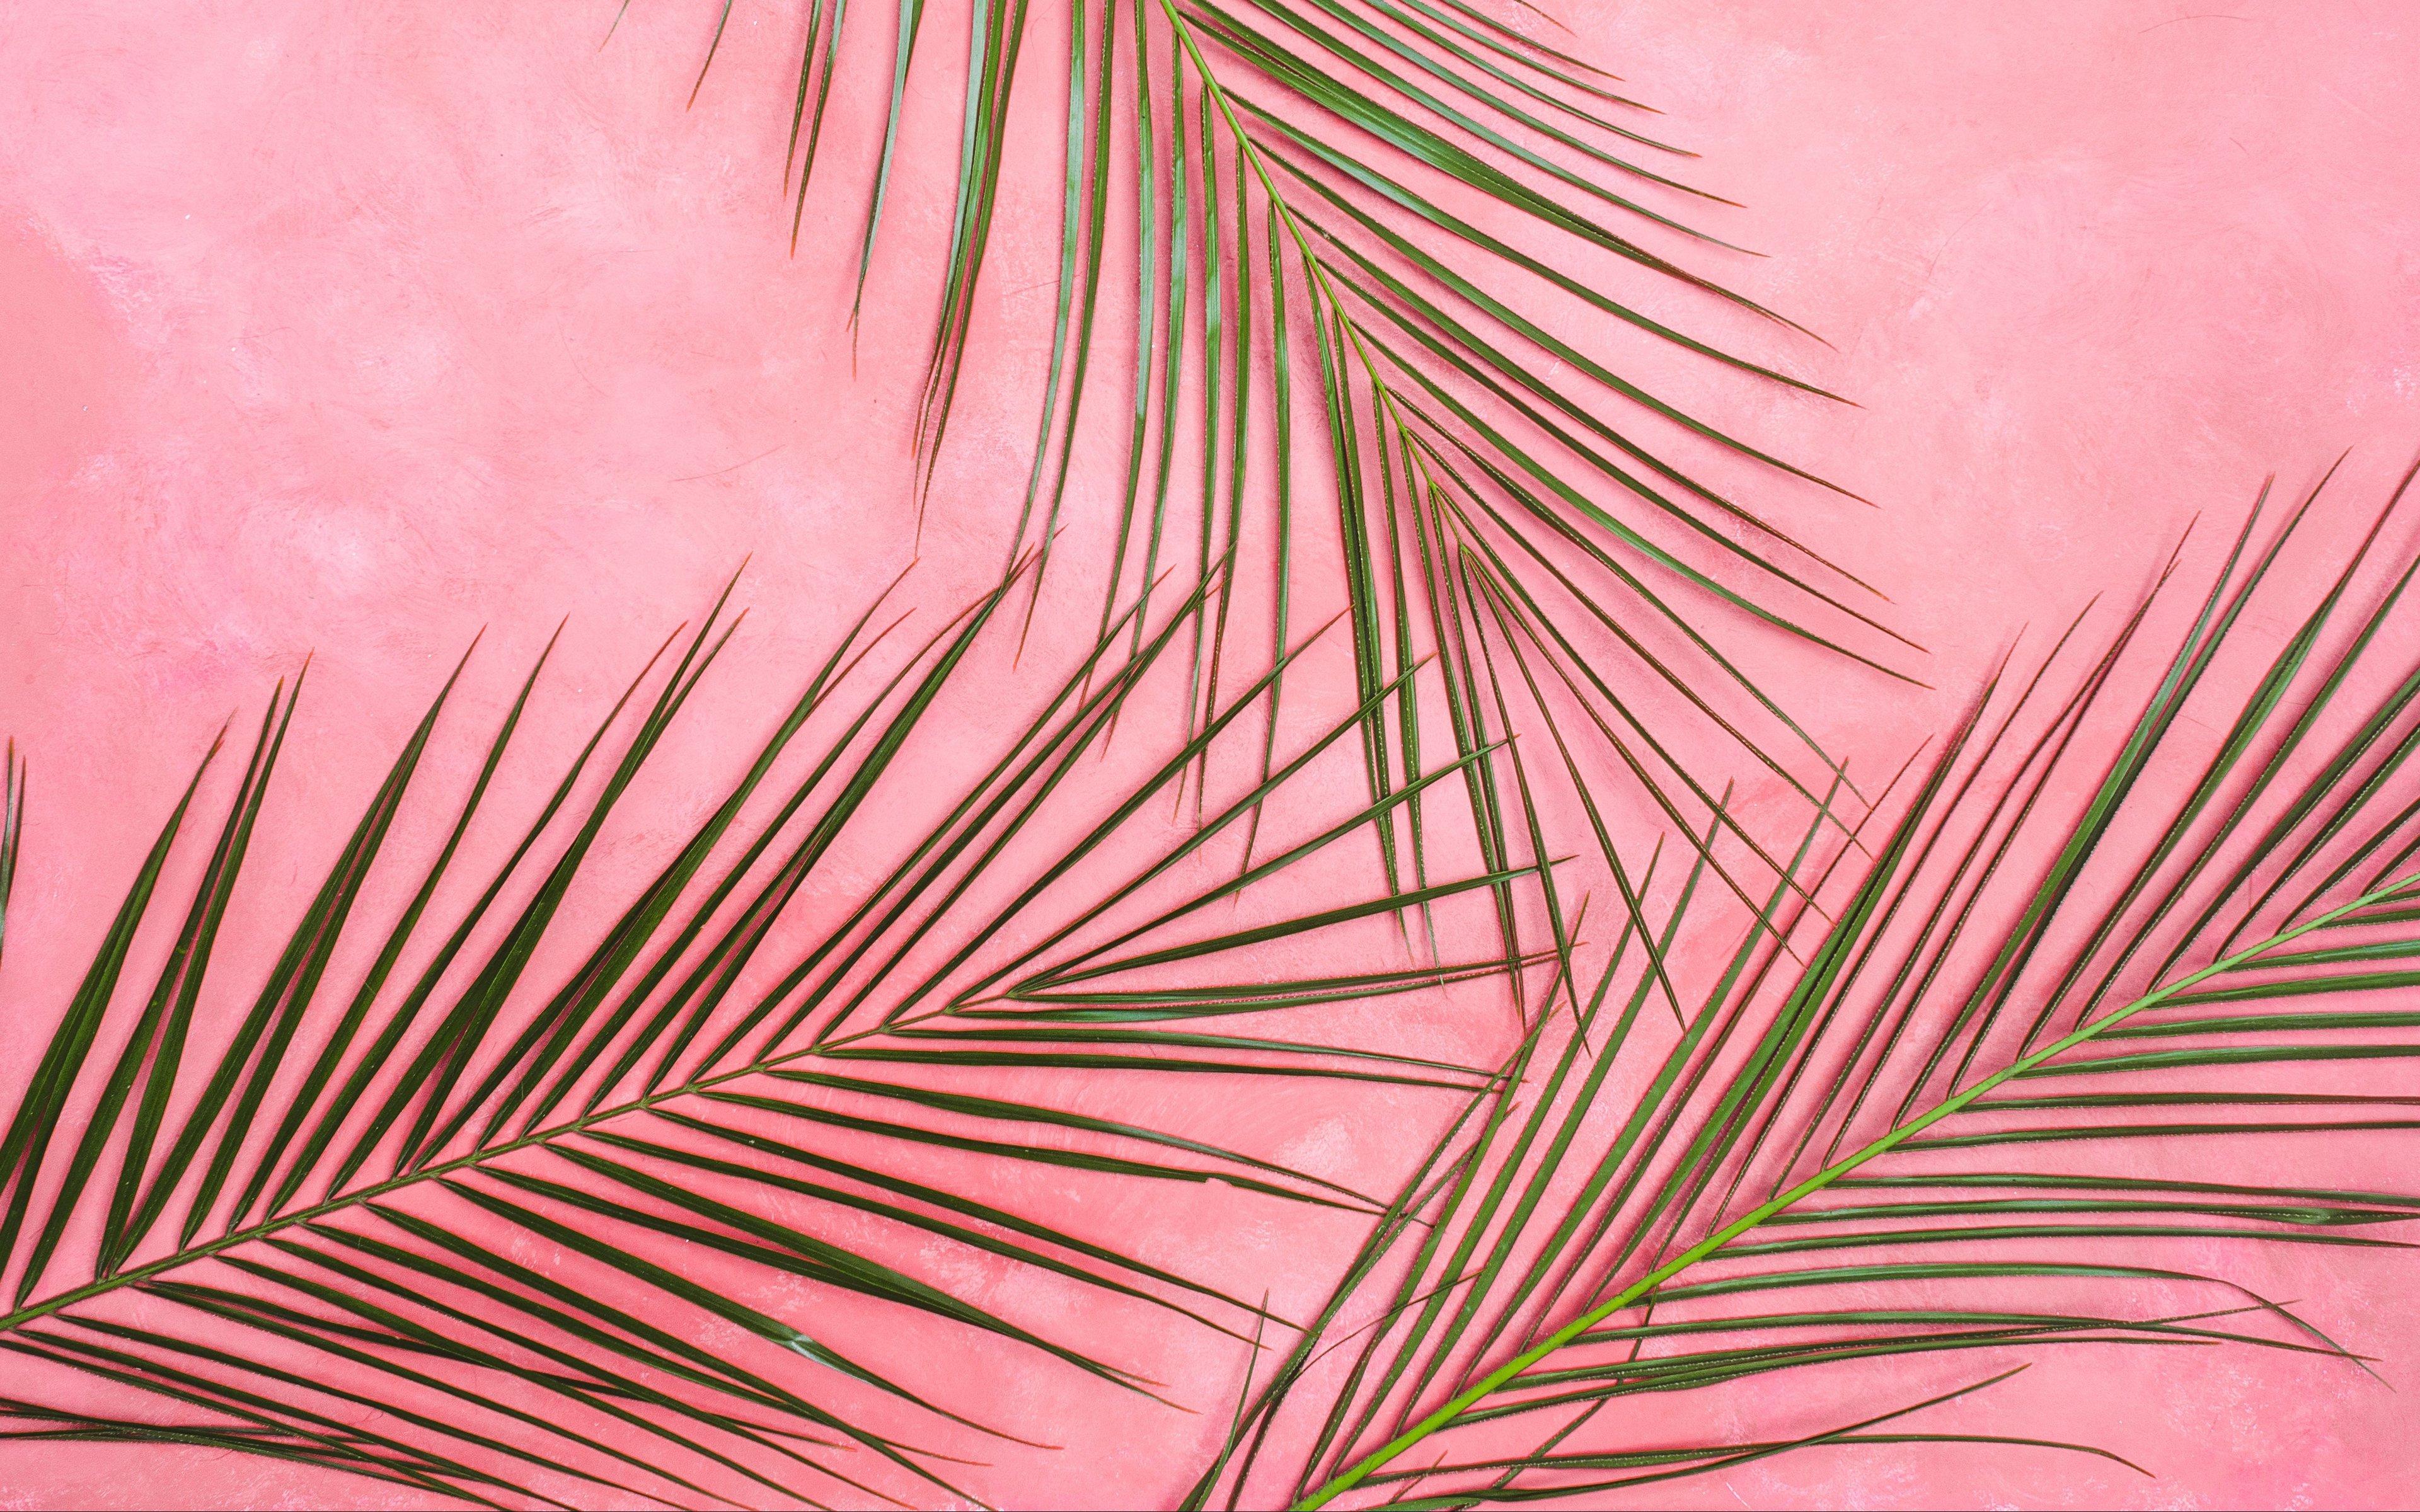 Fondos de pantalla Palmas en pared rosa pastel